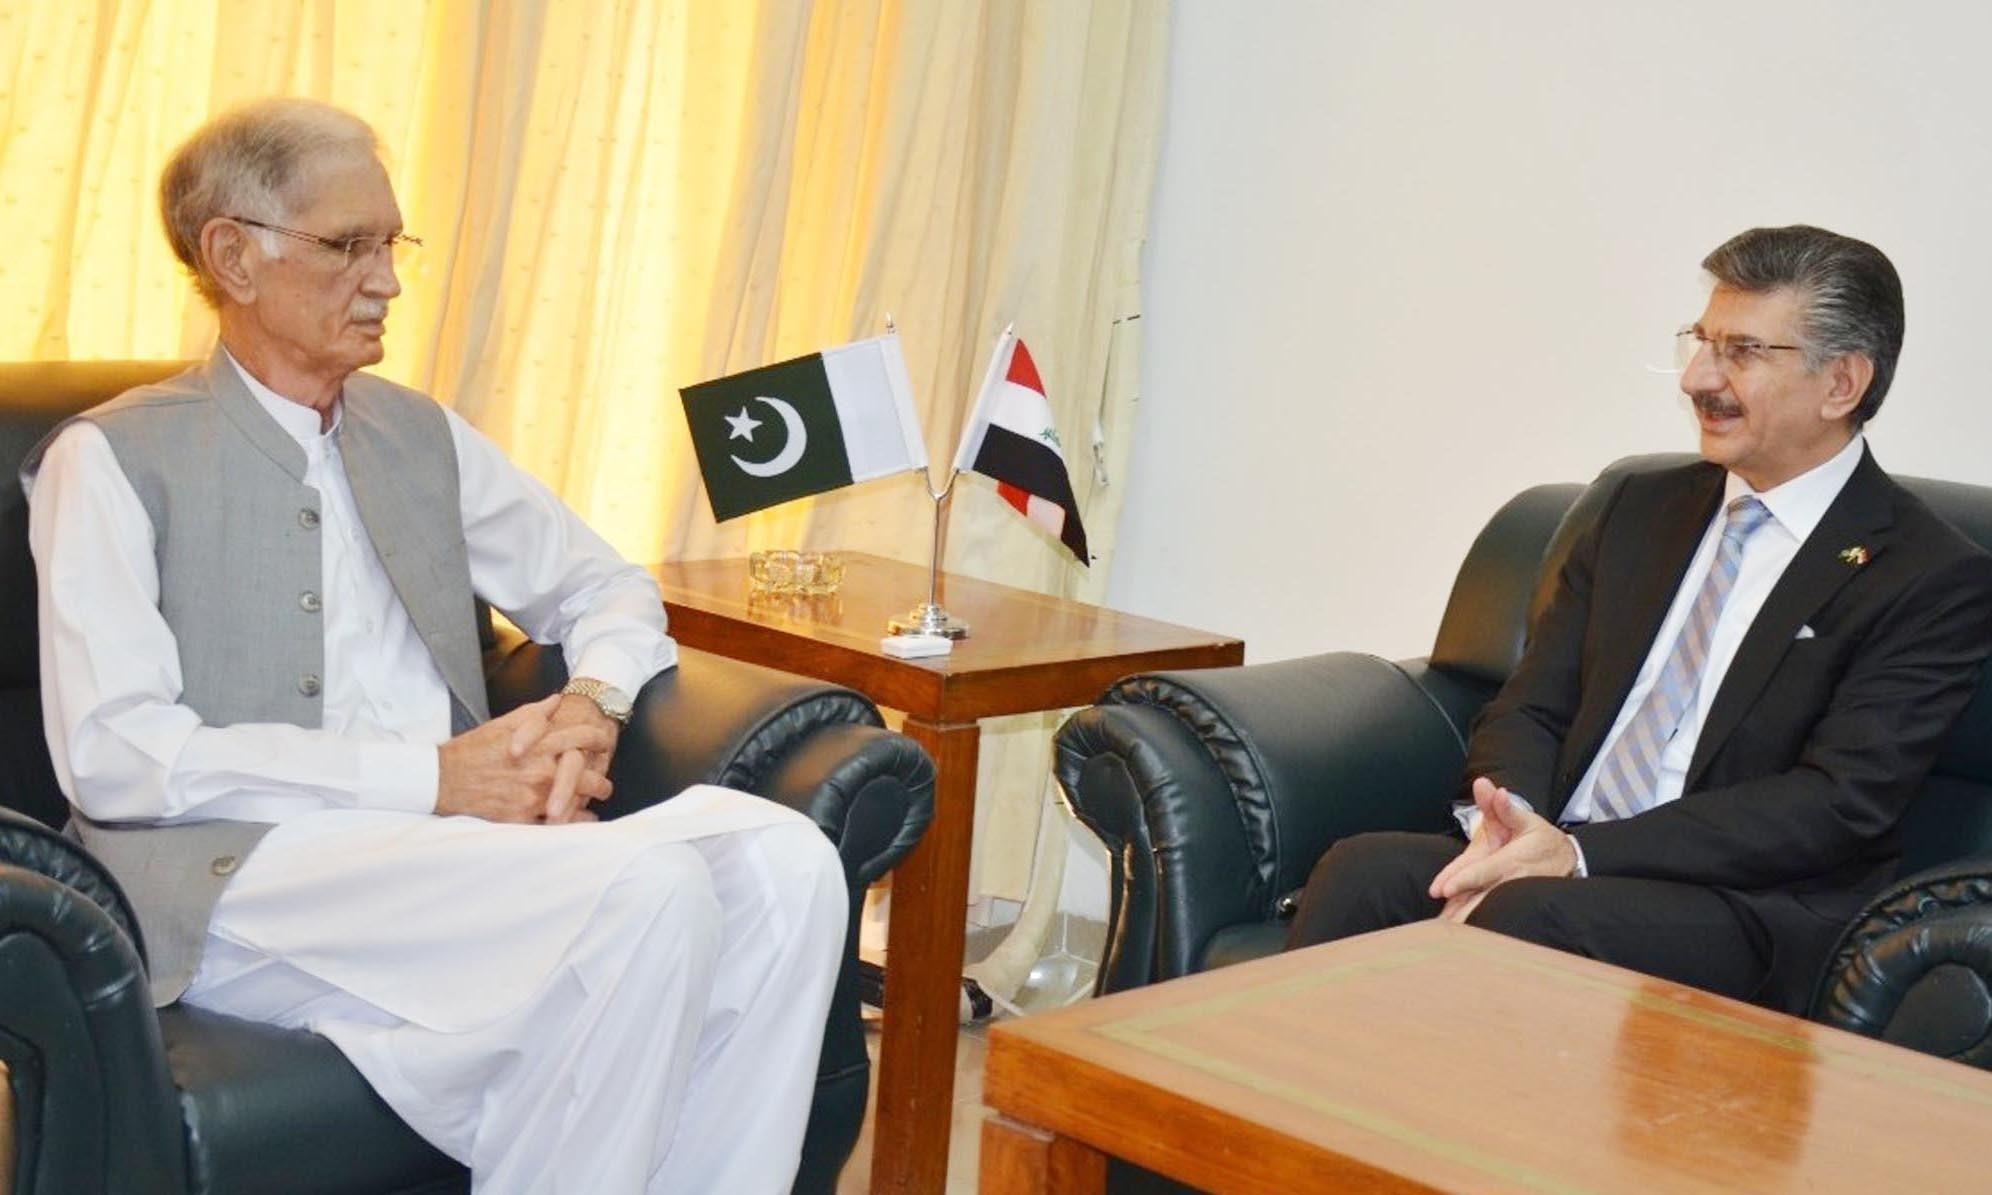 Iraqi envoy Hamid Abbas Lafta called on Minister for Defence Pervez Khattak in Islamabad on September 30. — Photo courtesy Radio Pakistan.